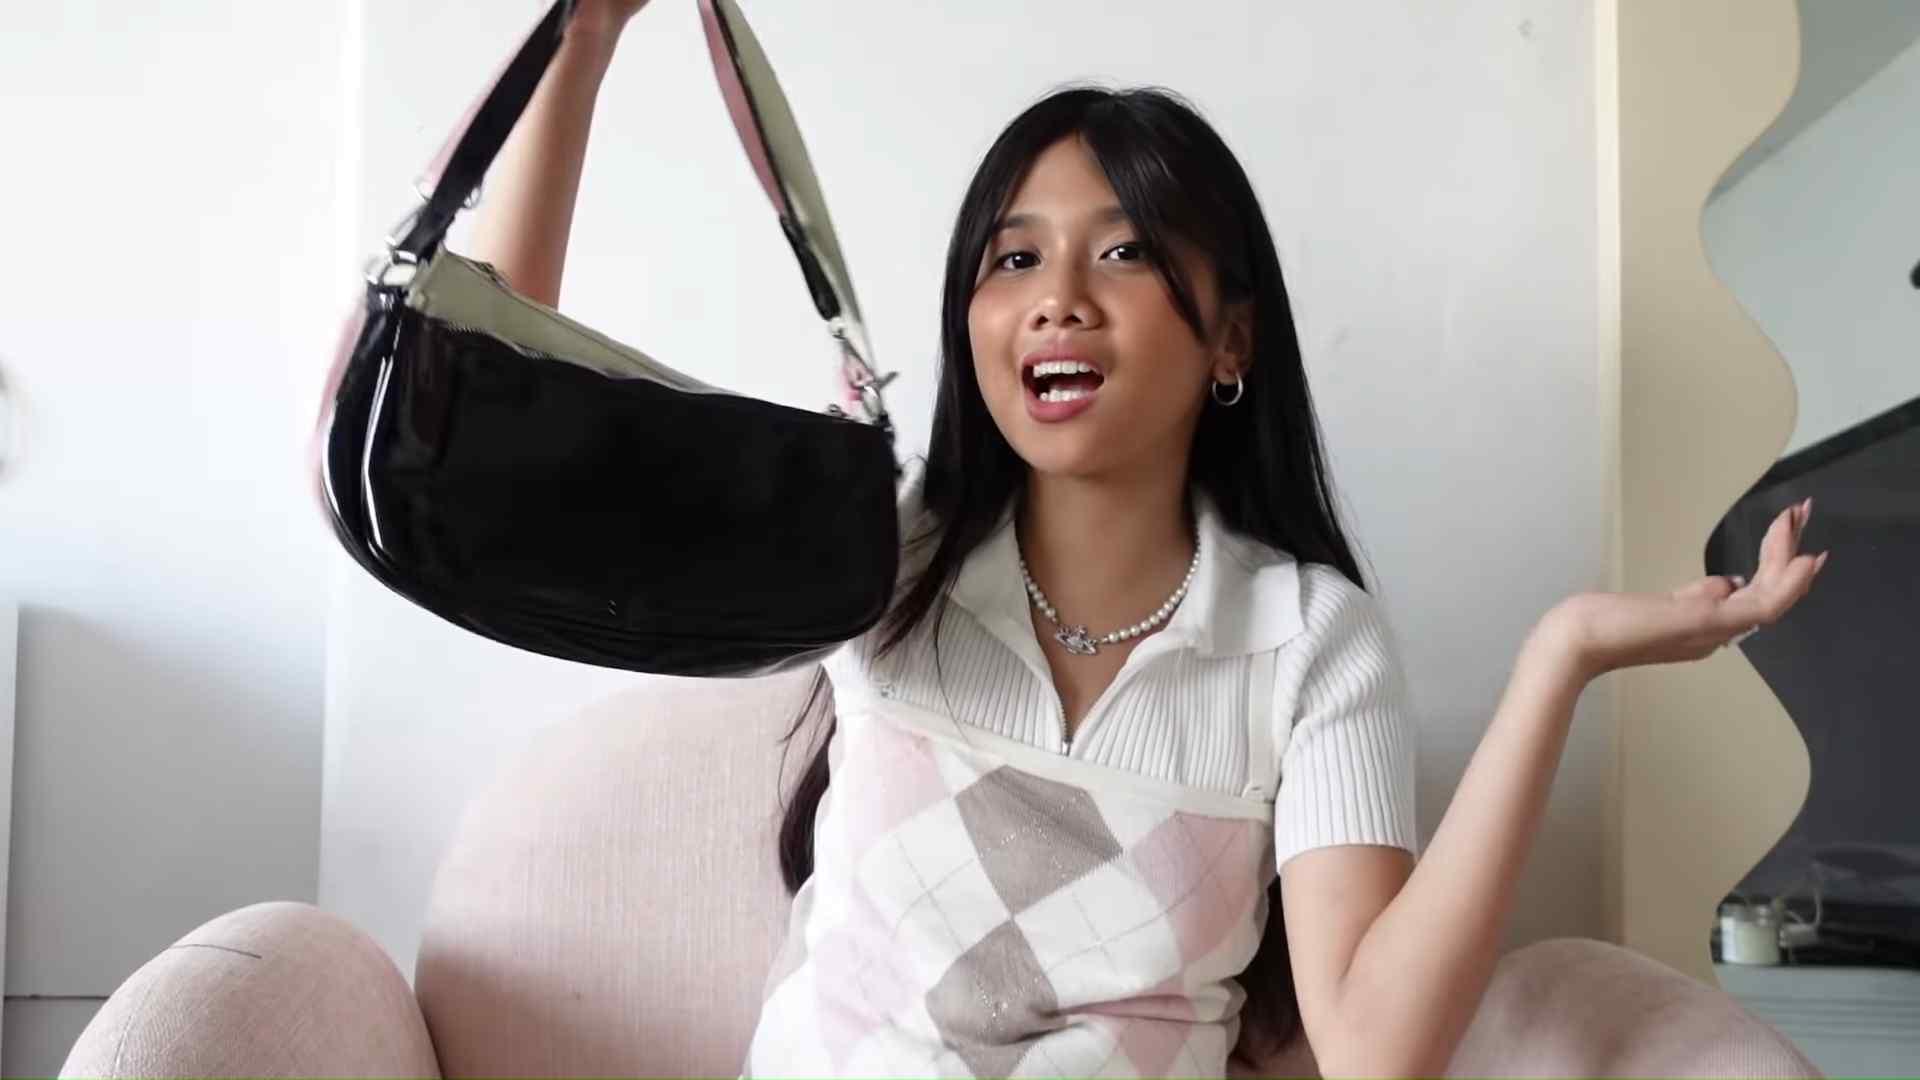 Ashley Garcia's Bag Haul - the 'shopee' bag